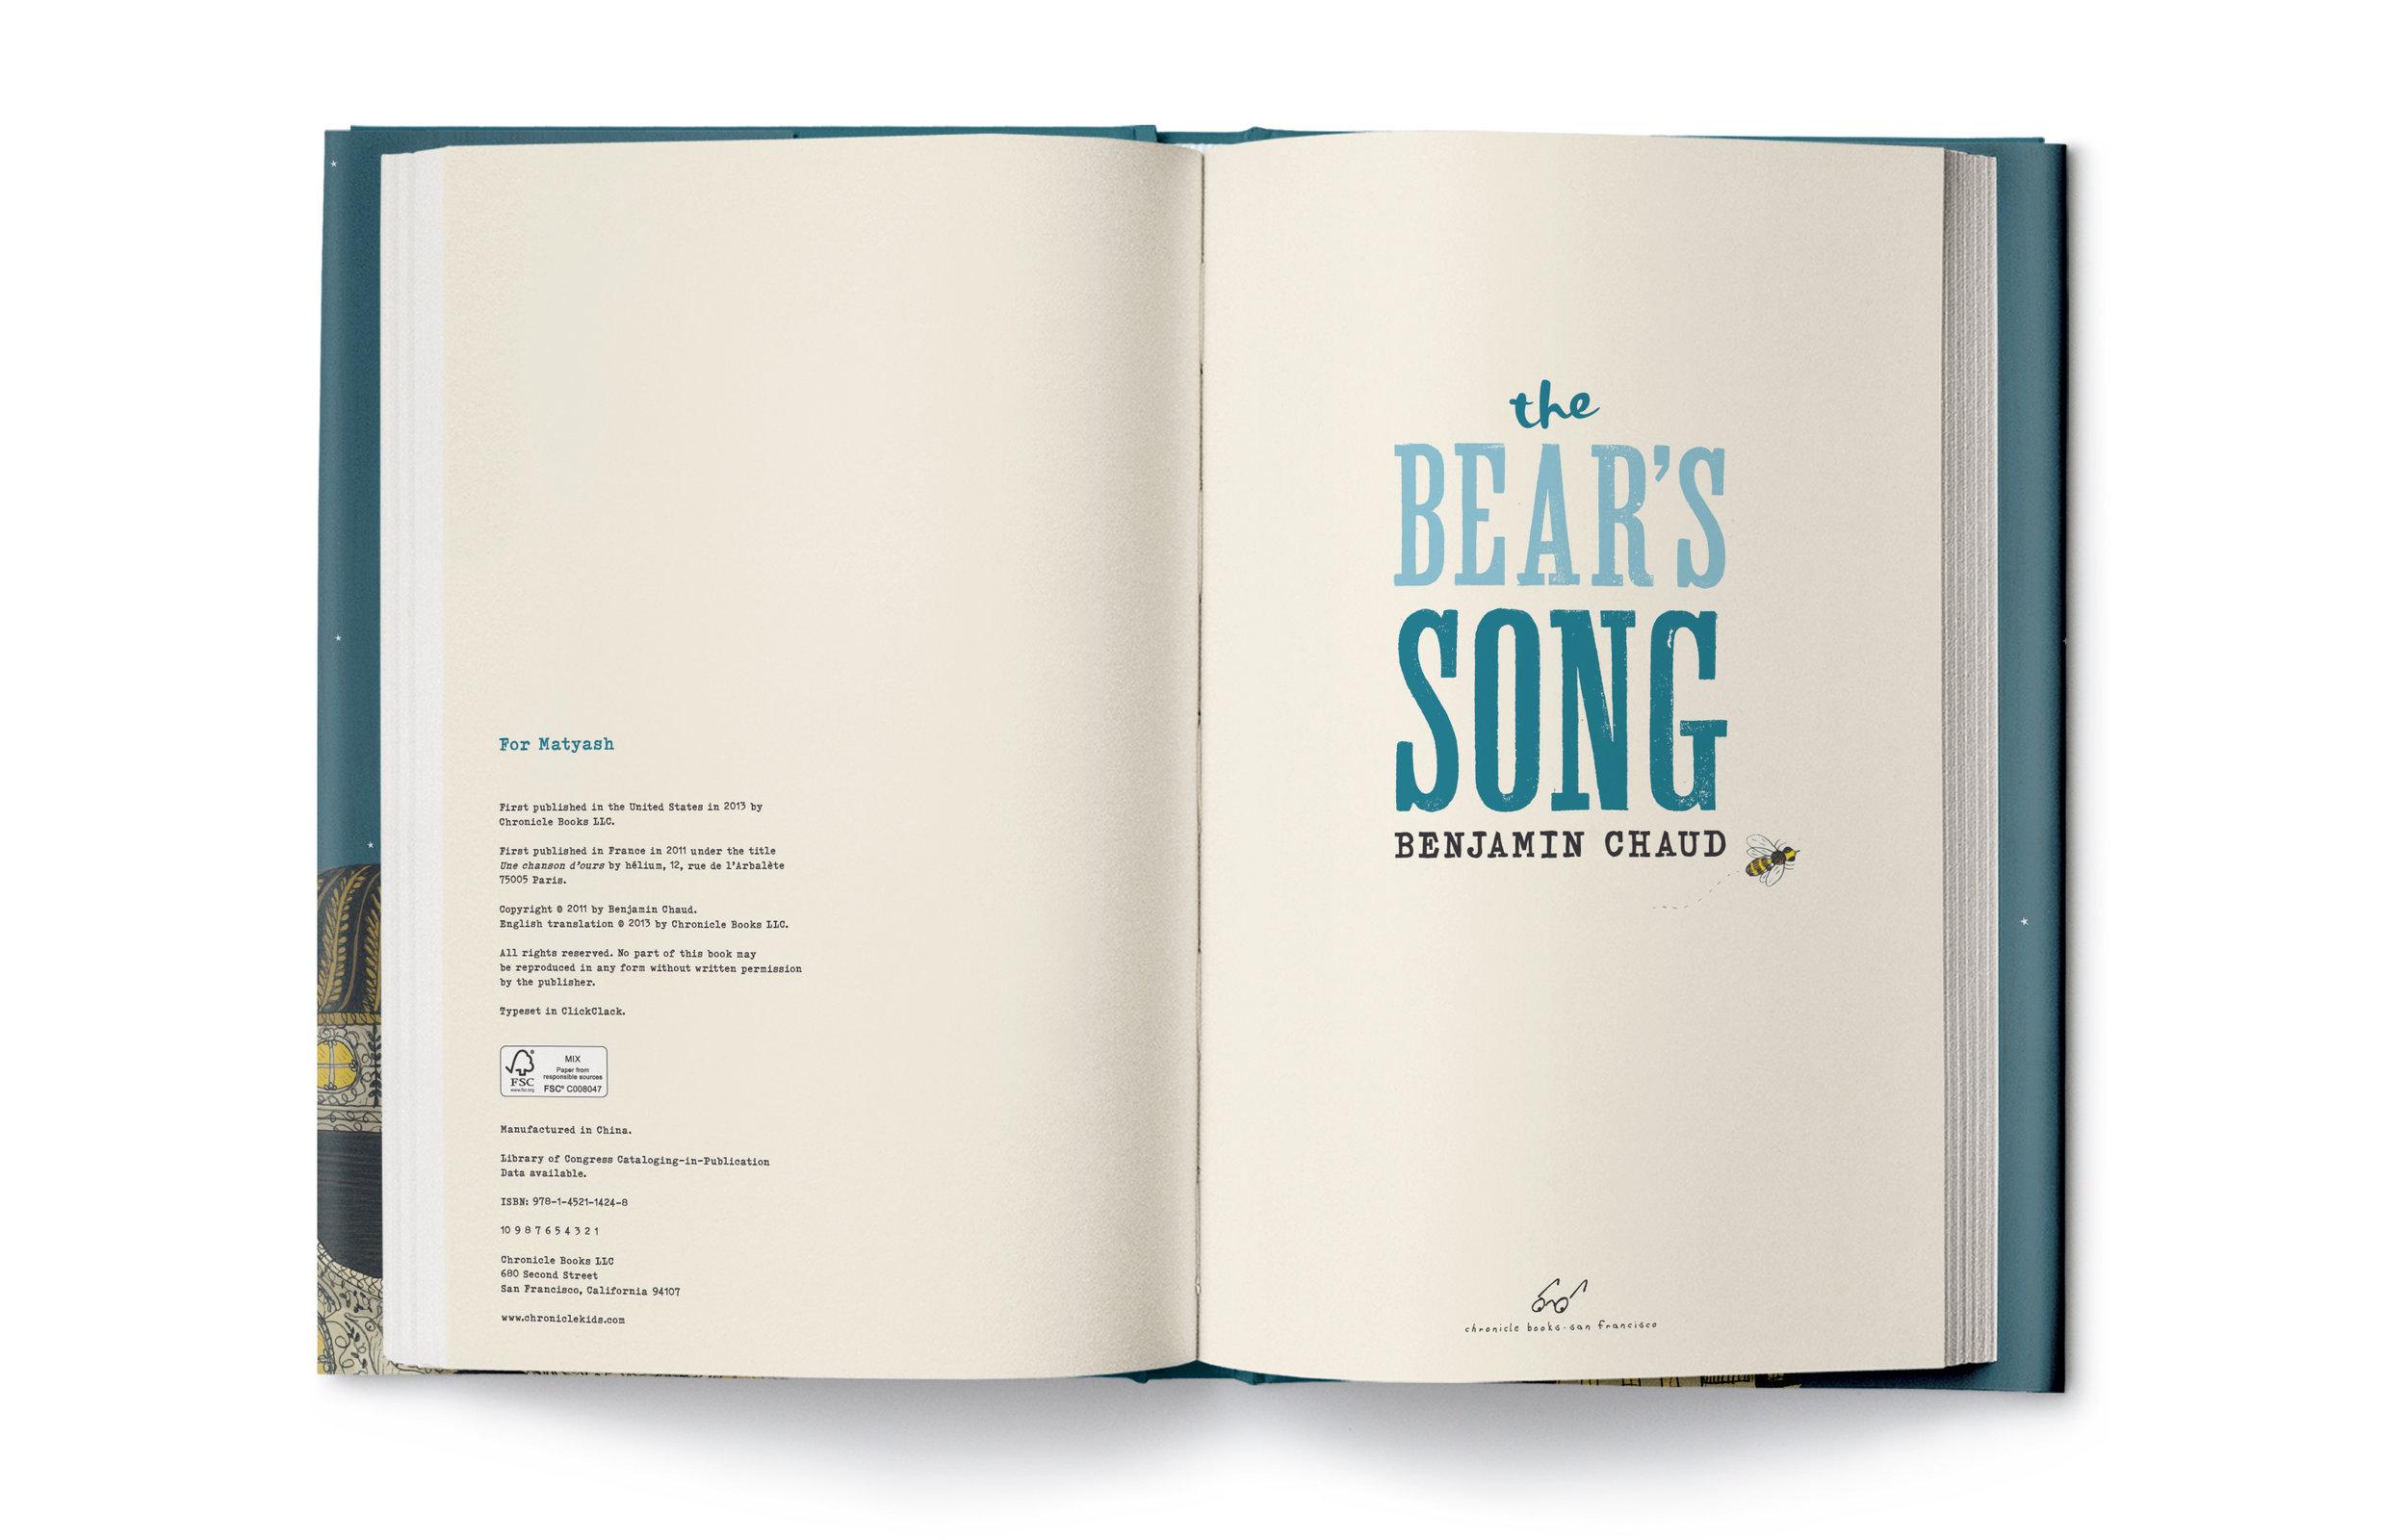 Bear-mockup-1.jpg